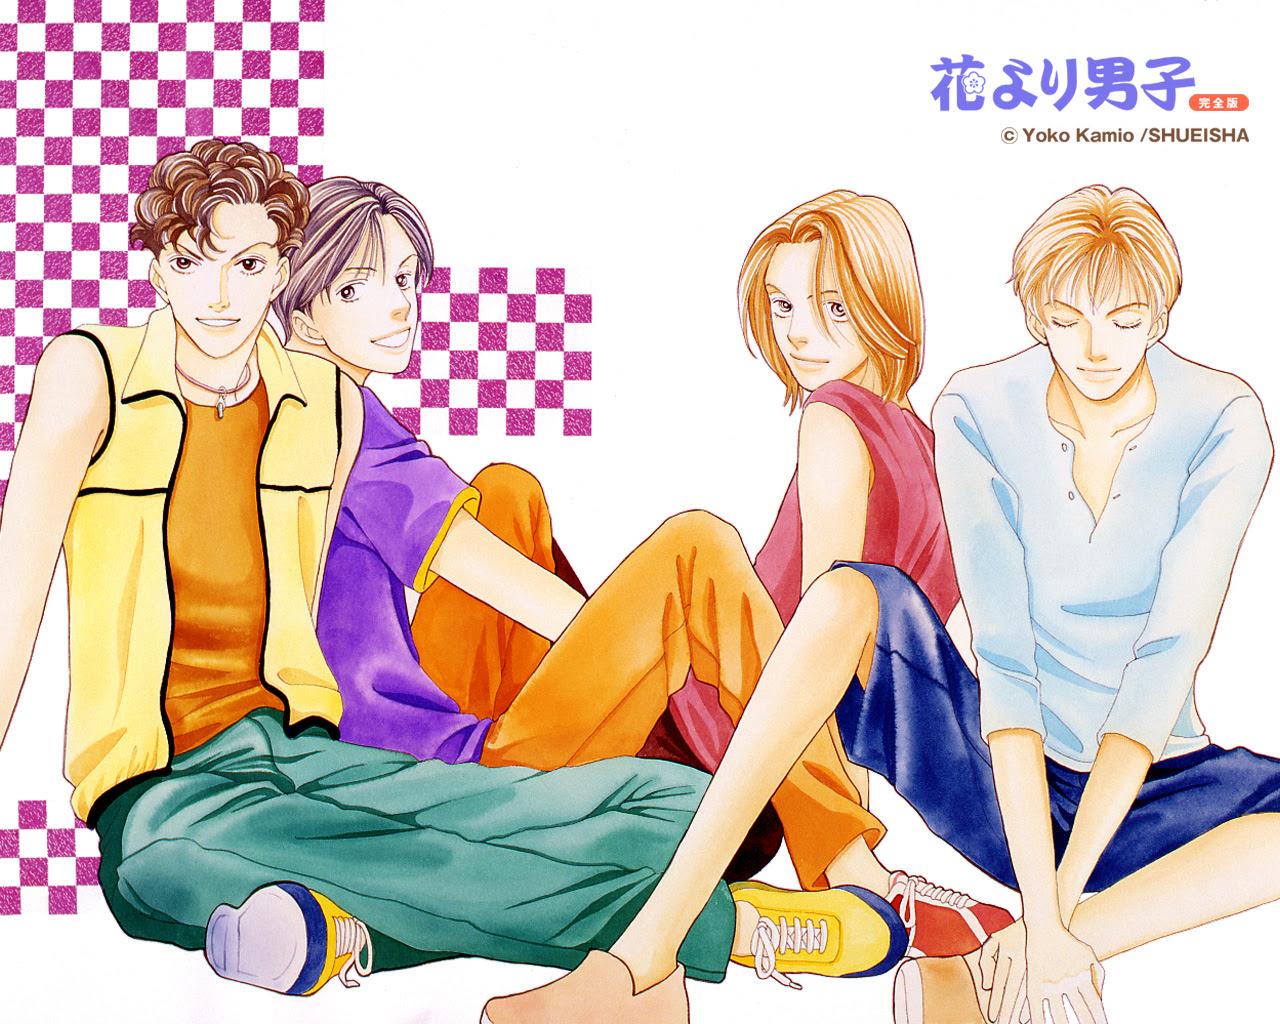 F4 Hana Yori Dango 花より男子 Wallpaper 35231114 Fanpop